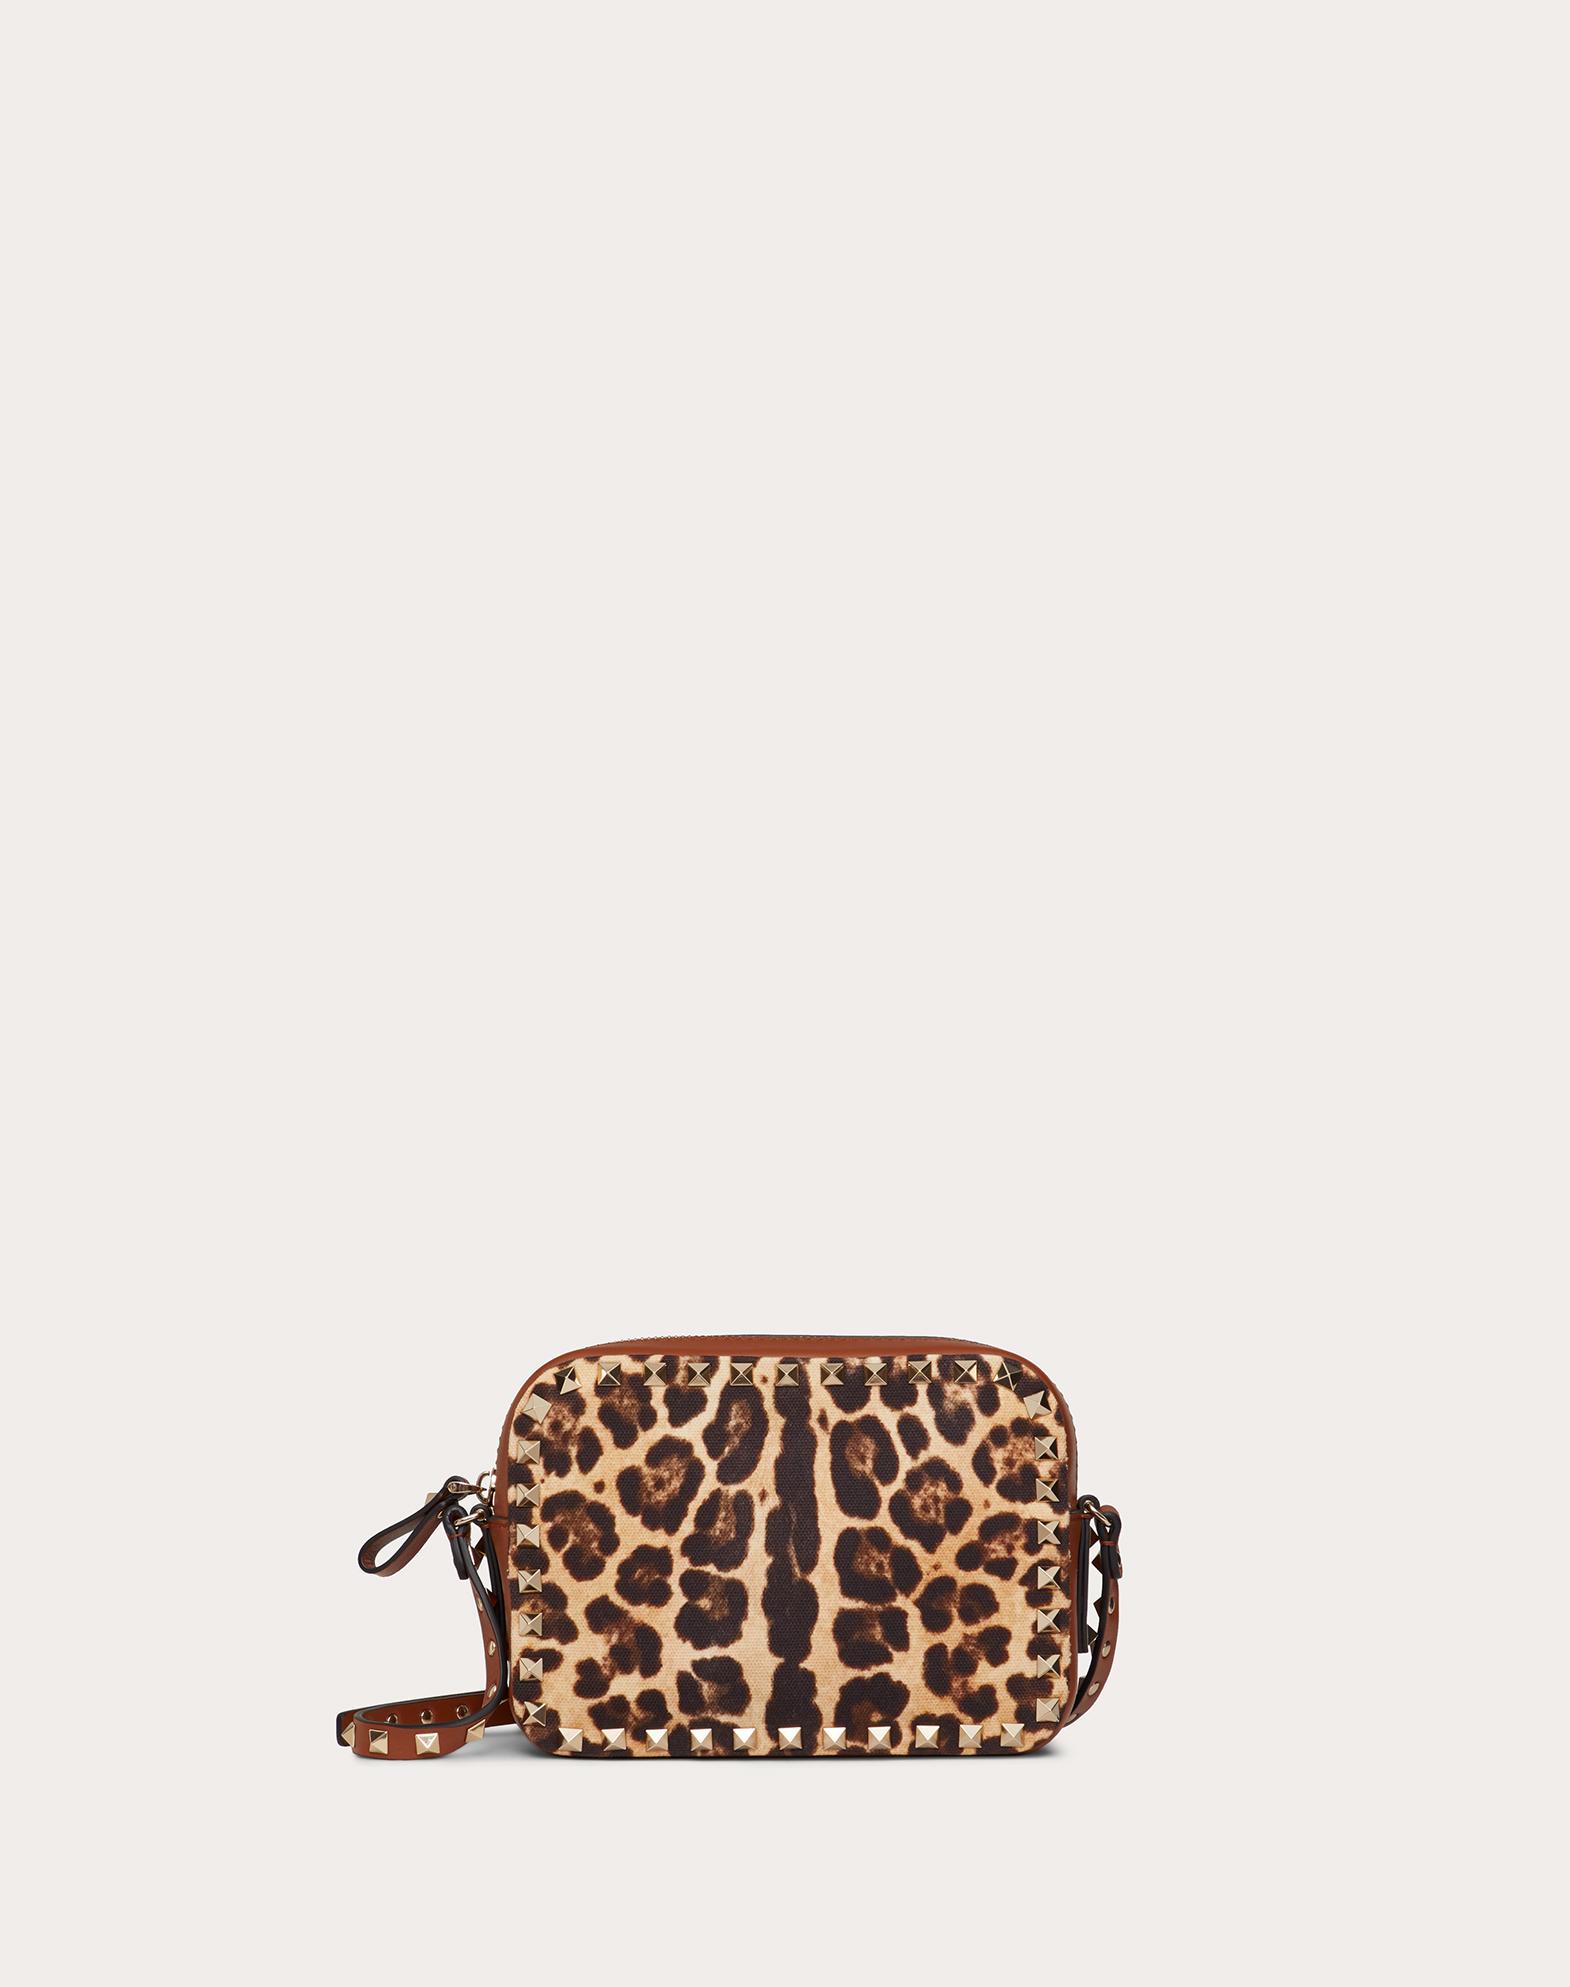 Small Rockstud Crossbody Bag in Leopard Print Canvas